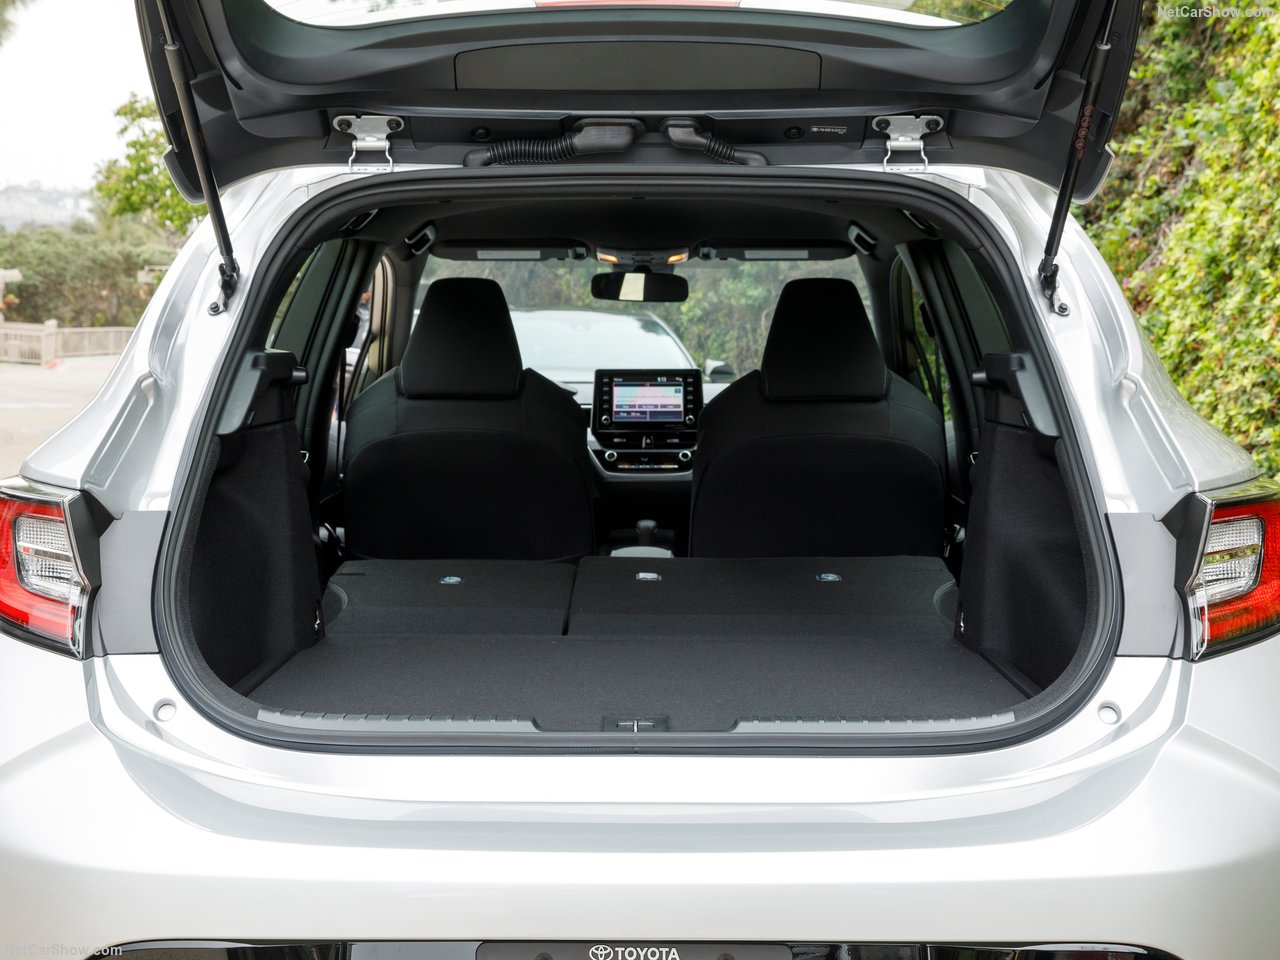 Toyota-Corolla_Hatchback-2019-1280-57.jpg